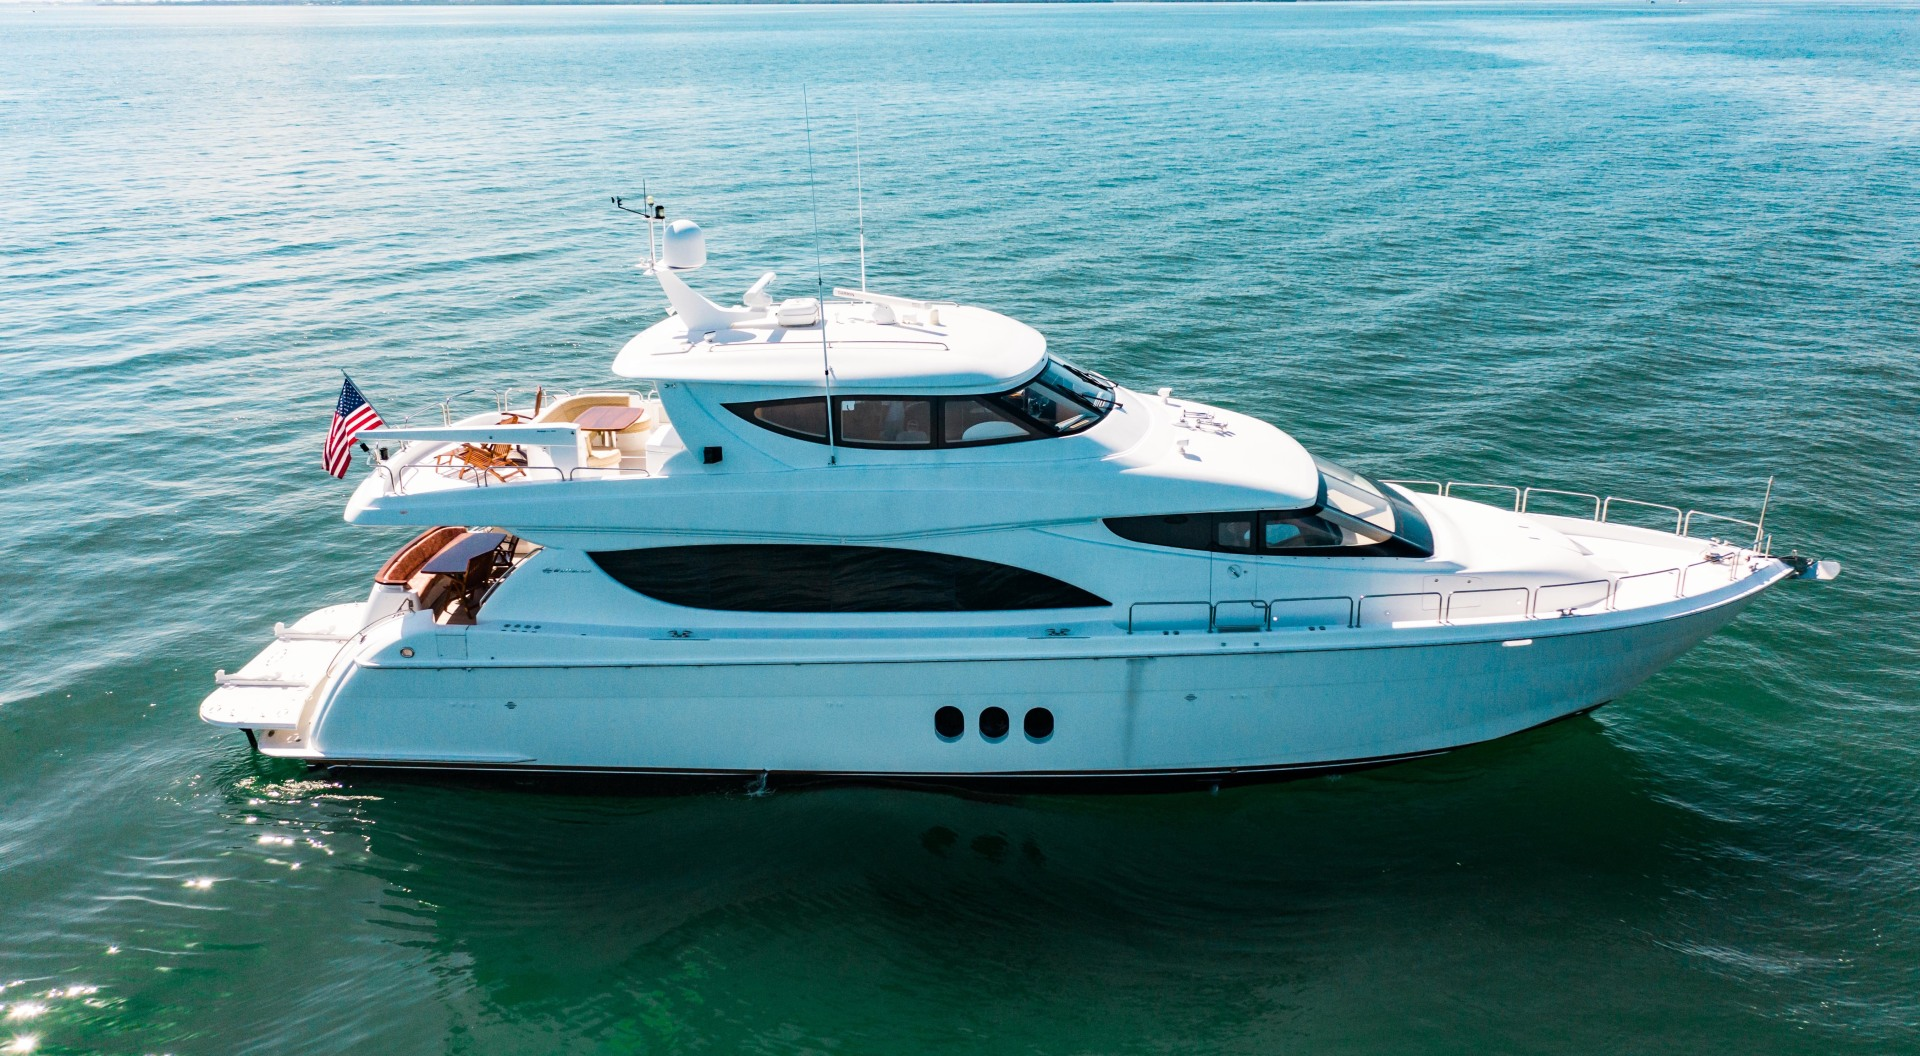 Hatteras-80 Motor Yacht 2008-Galati Yacht Sales Trade Anna Maria-Florida-United States-2008 Hatteras 80 Motor Yacht  Galati Yacht Sales Trade-1466268 | Thumbnail